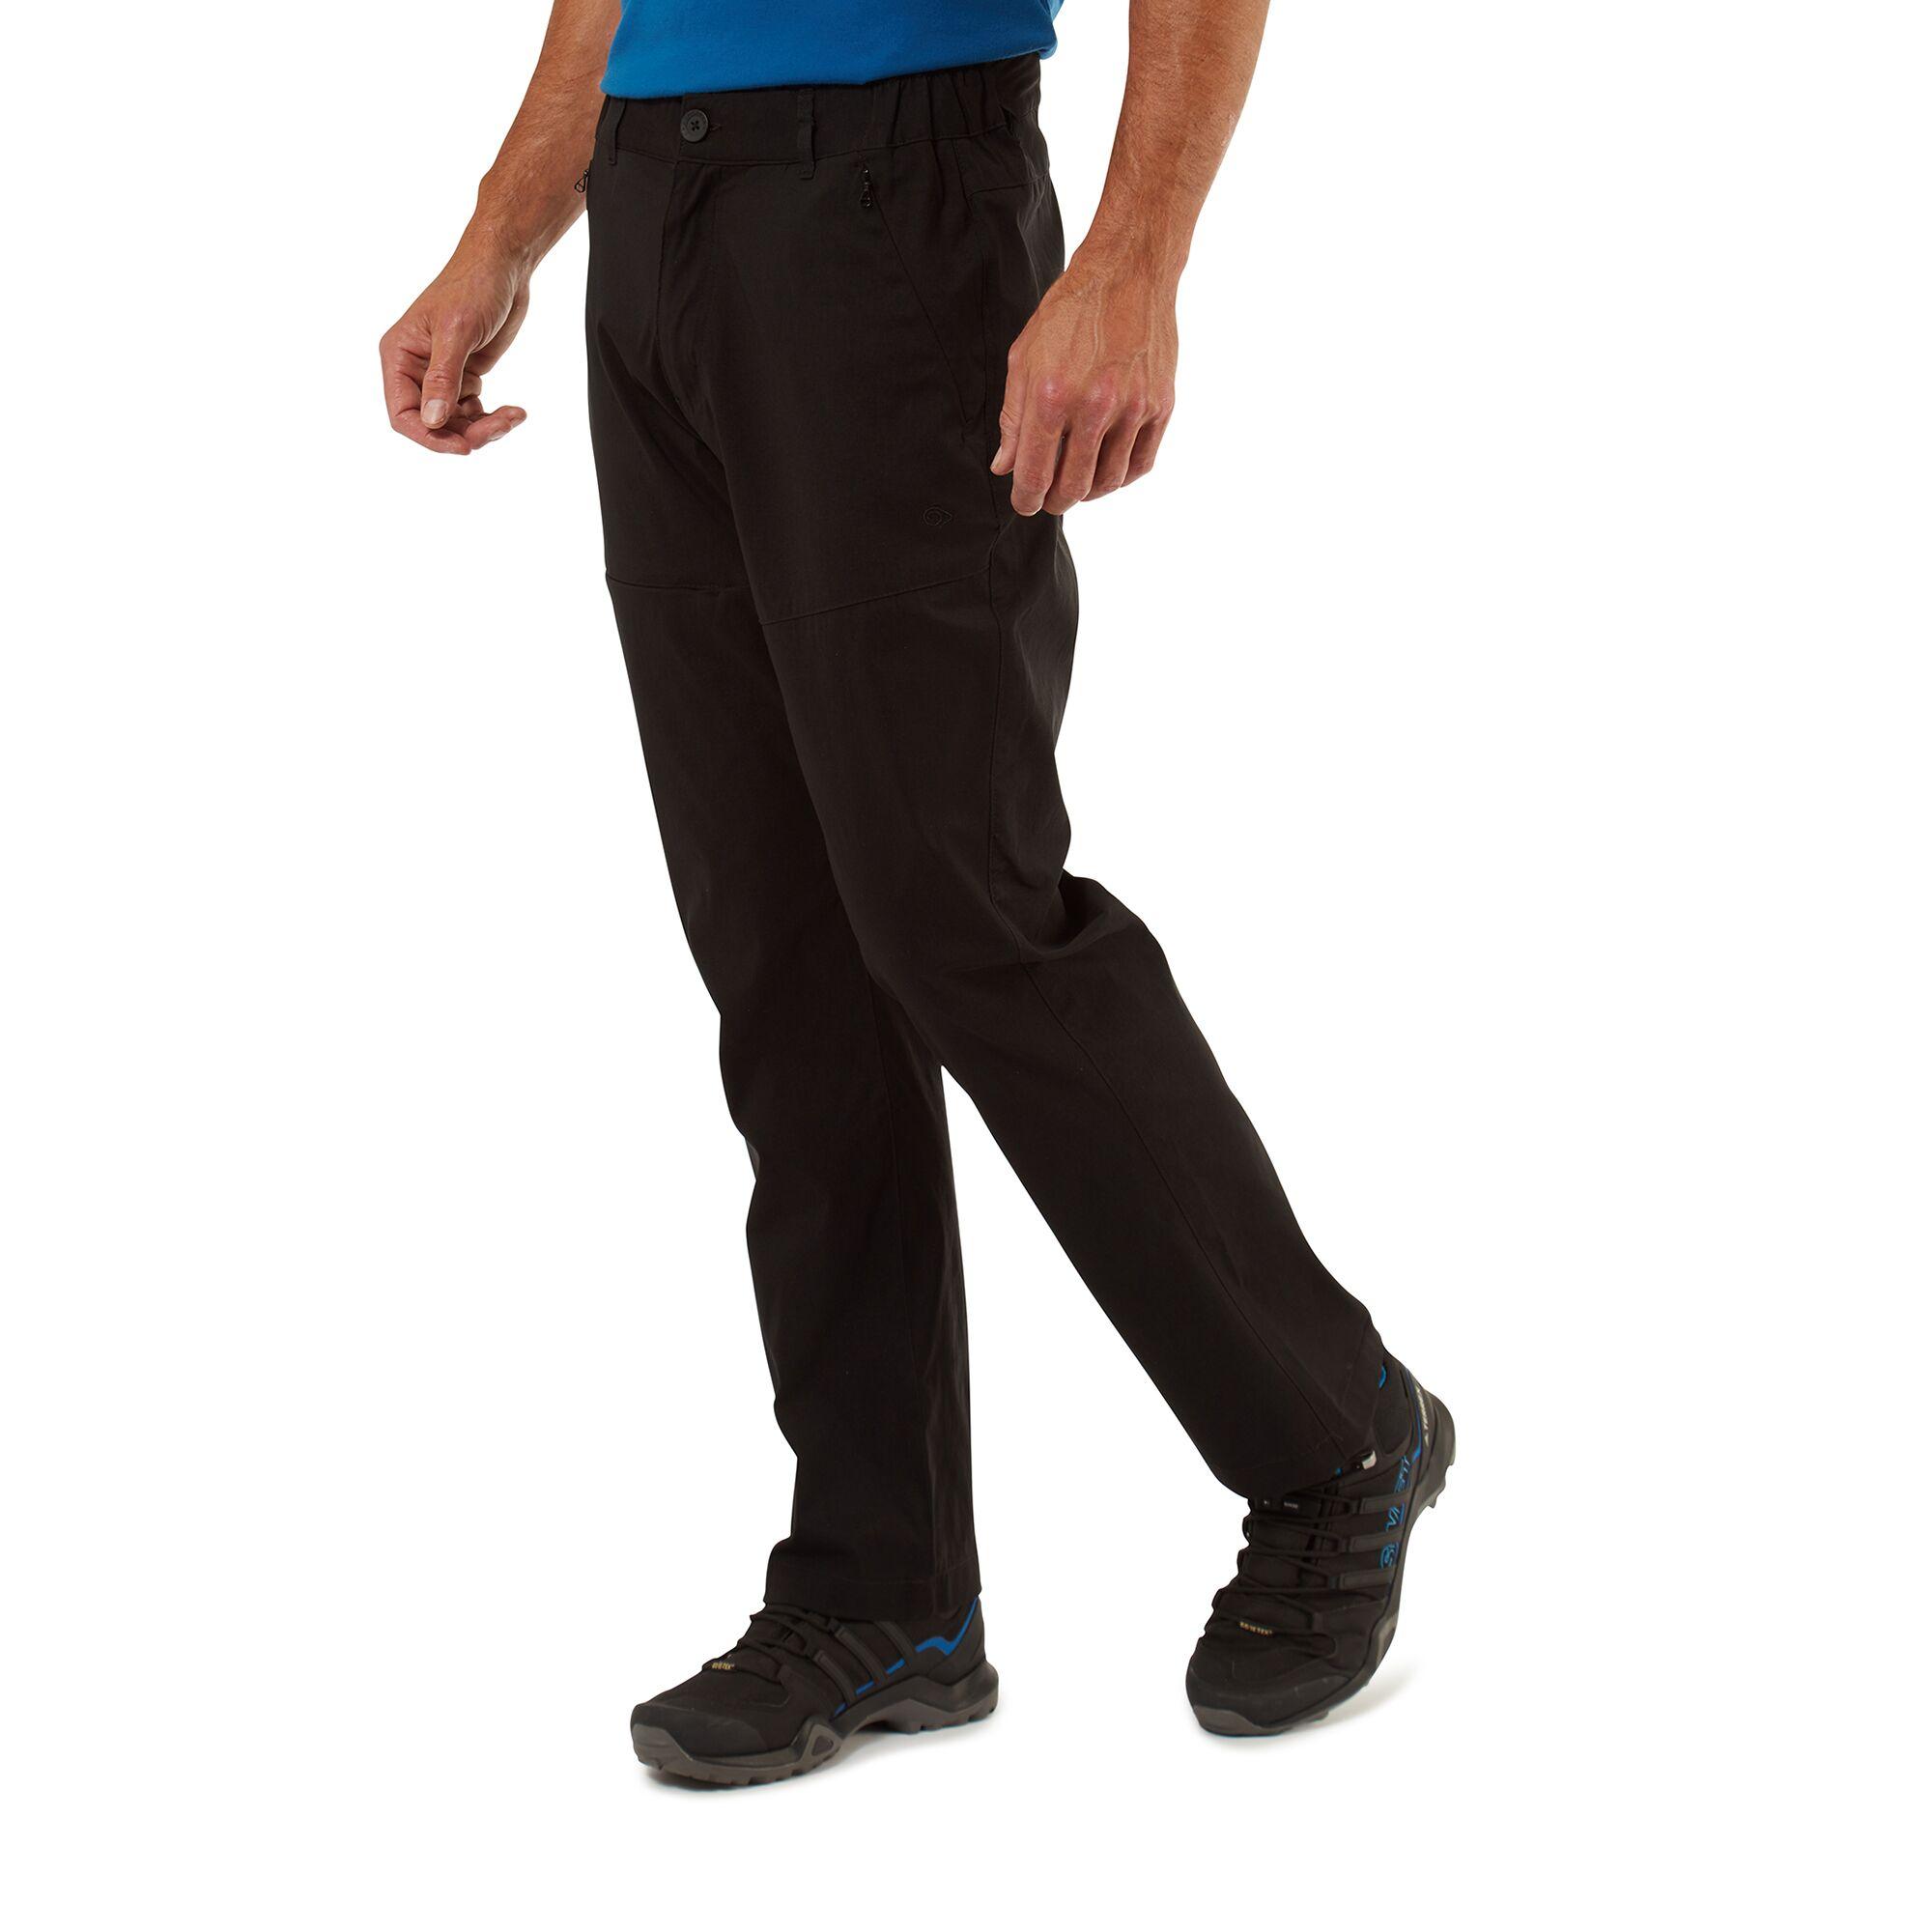 Craghoppers Mens Classic Kiwi Trousers - Bark - 30l